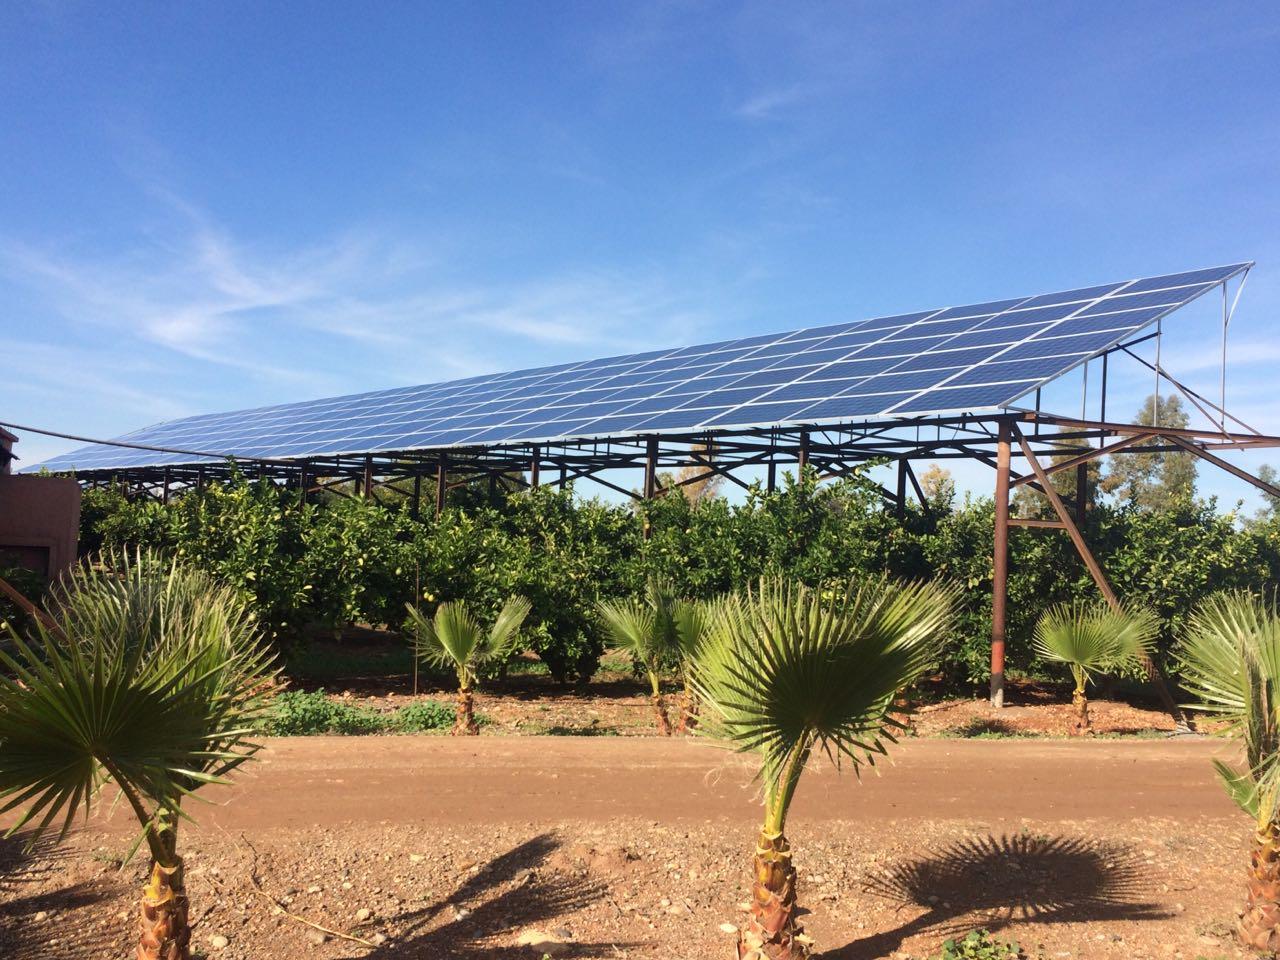 pompage solaire couplage injection et site isolé